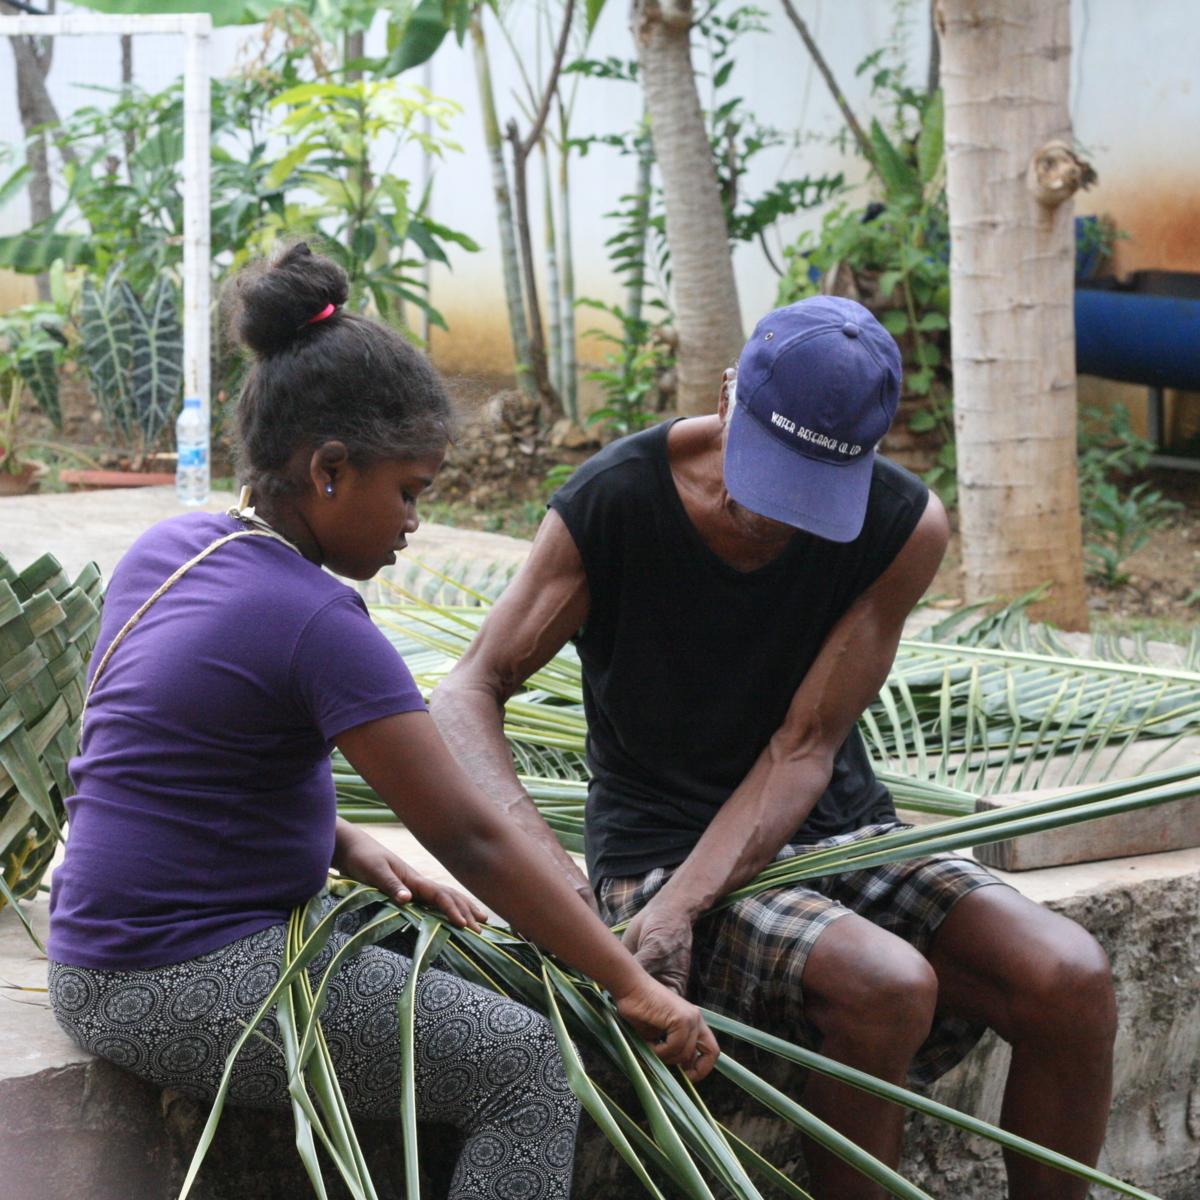 Basket weaving lesson